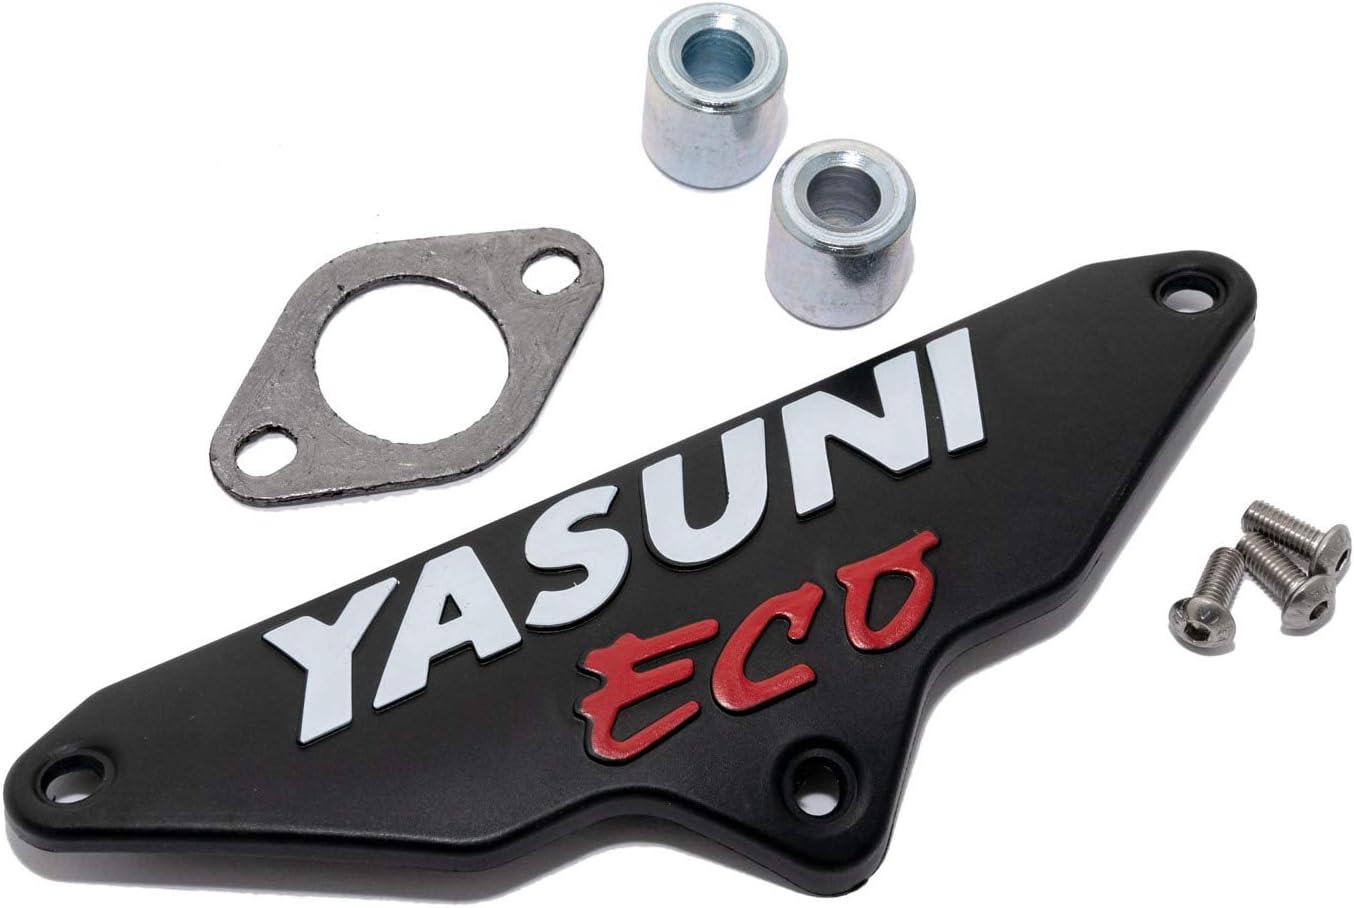 Auspuff YASUNI Eco Vespa Vespa LX 50